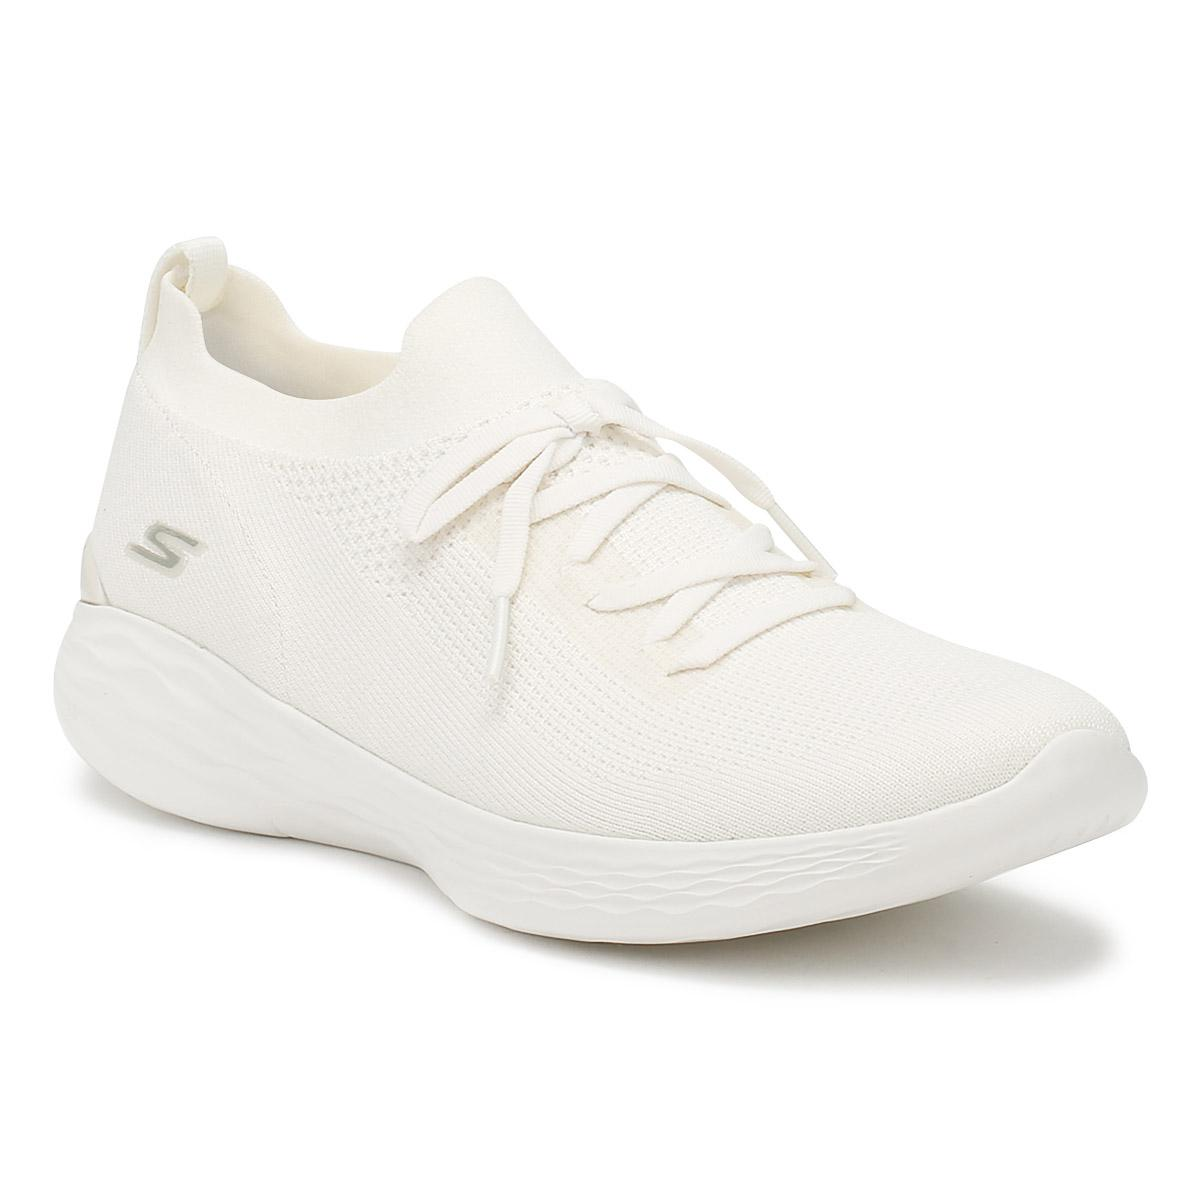 Skechers Womens White You Shine